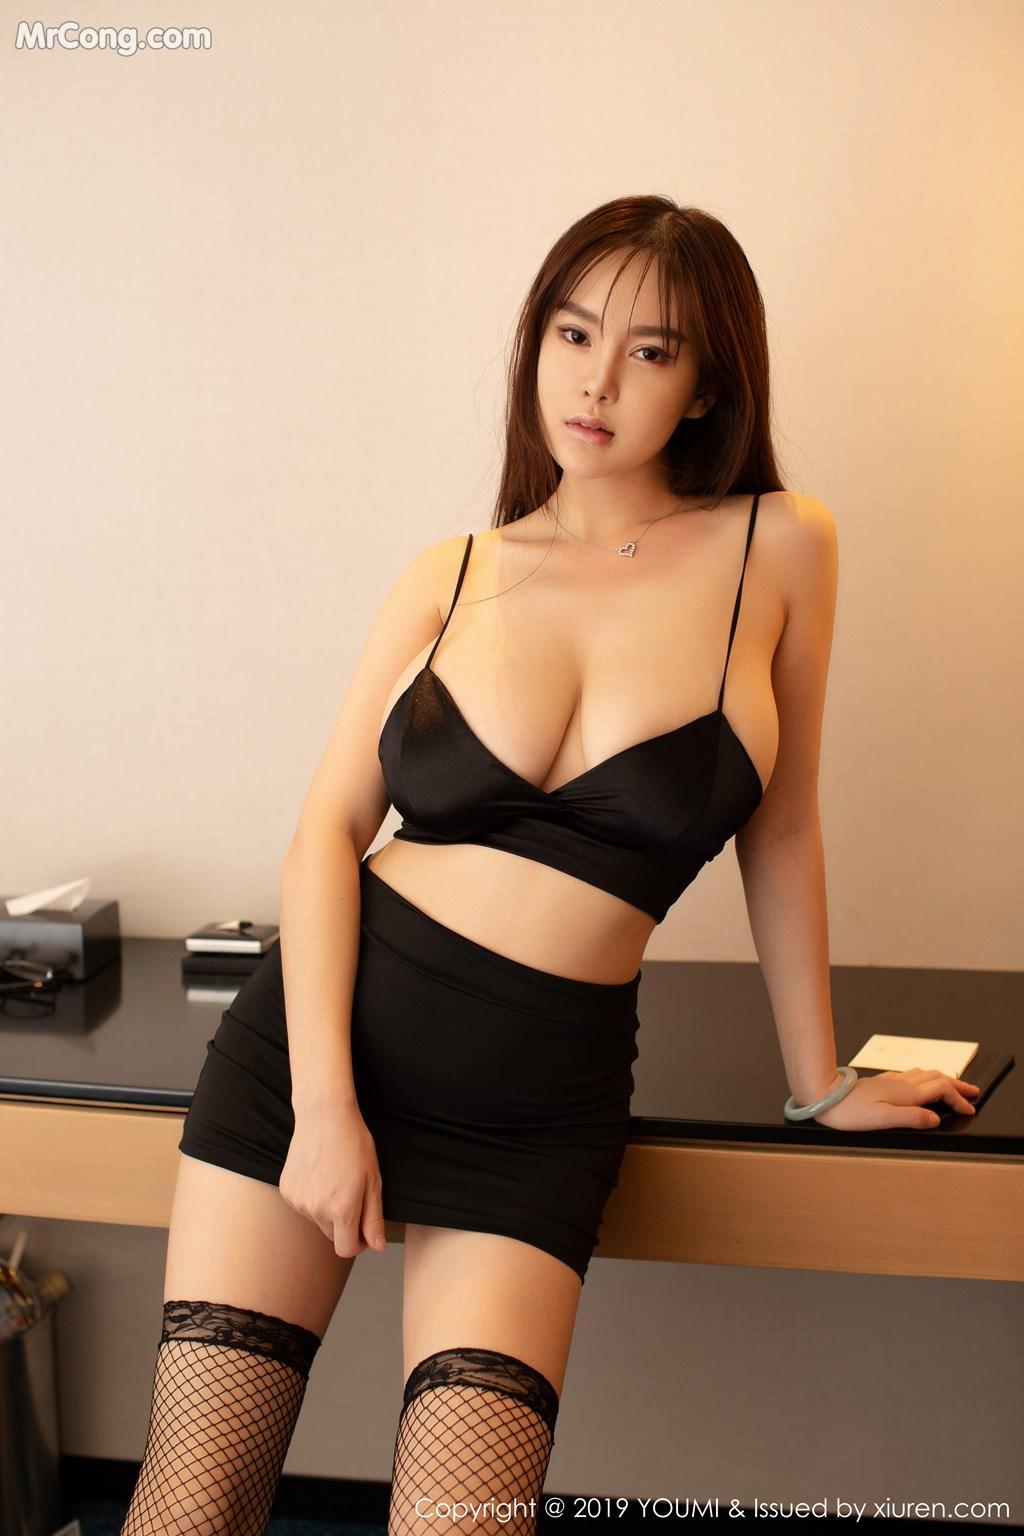 Image YouMi-Vol.311-Silvia-MrCong.com-024 in post YouMi Vol.311: 易阳Silvia (46 ảnh)